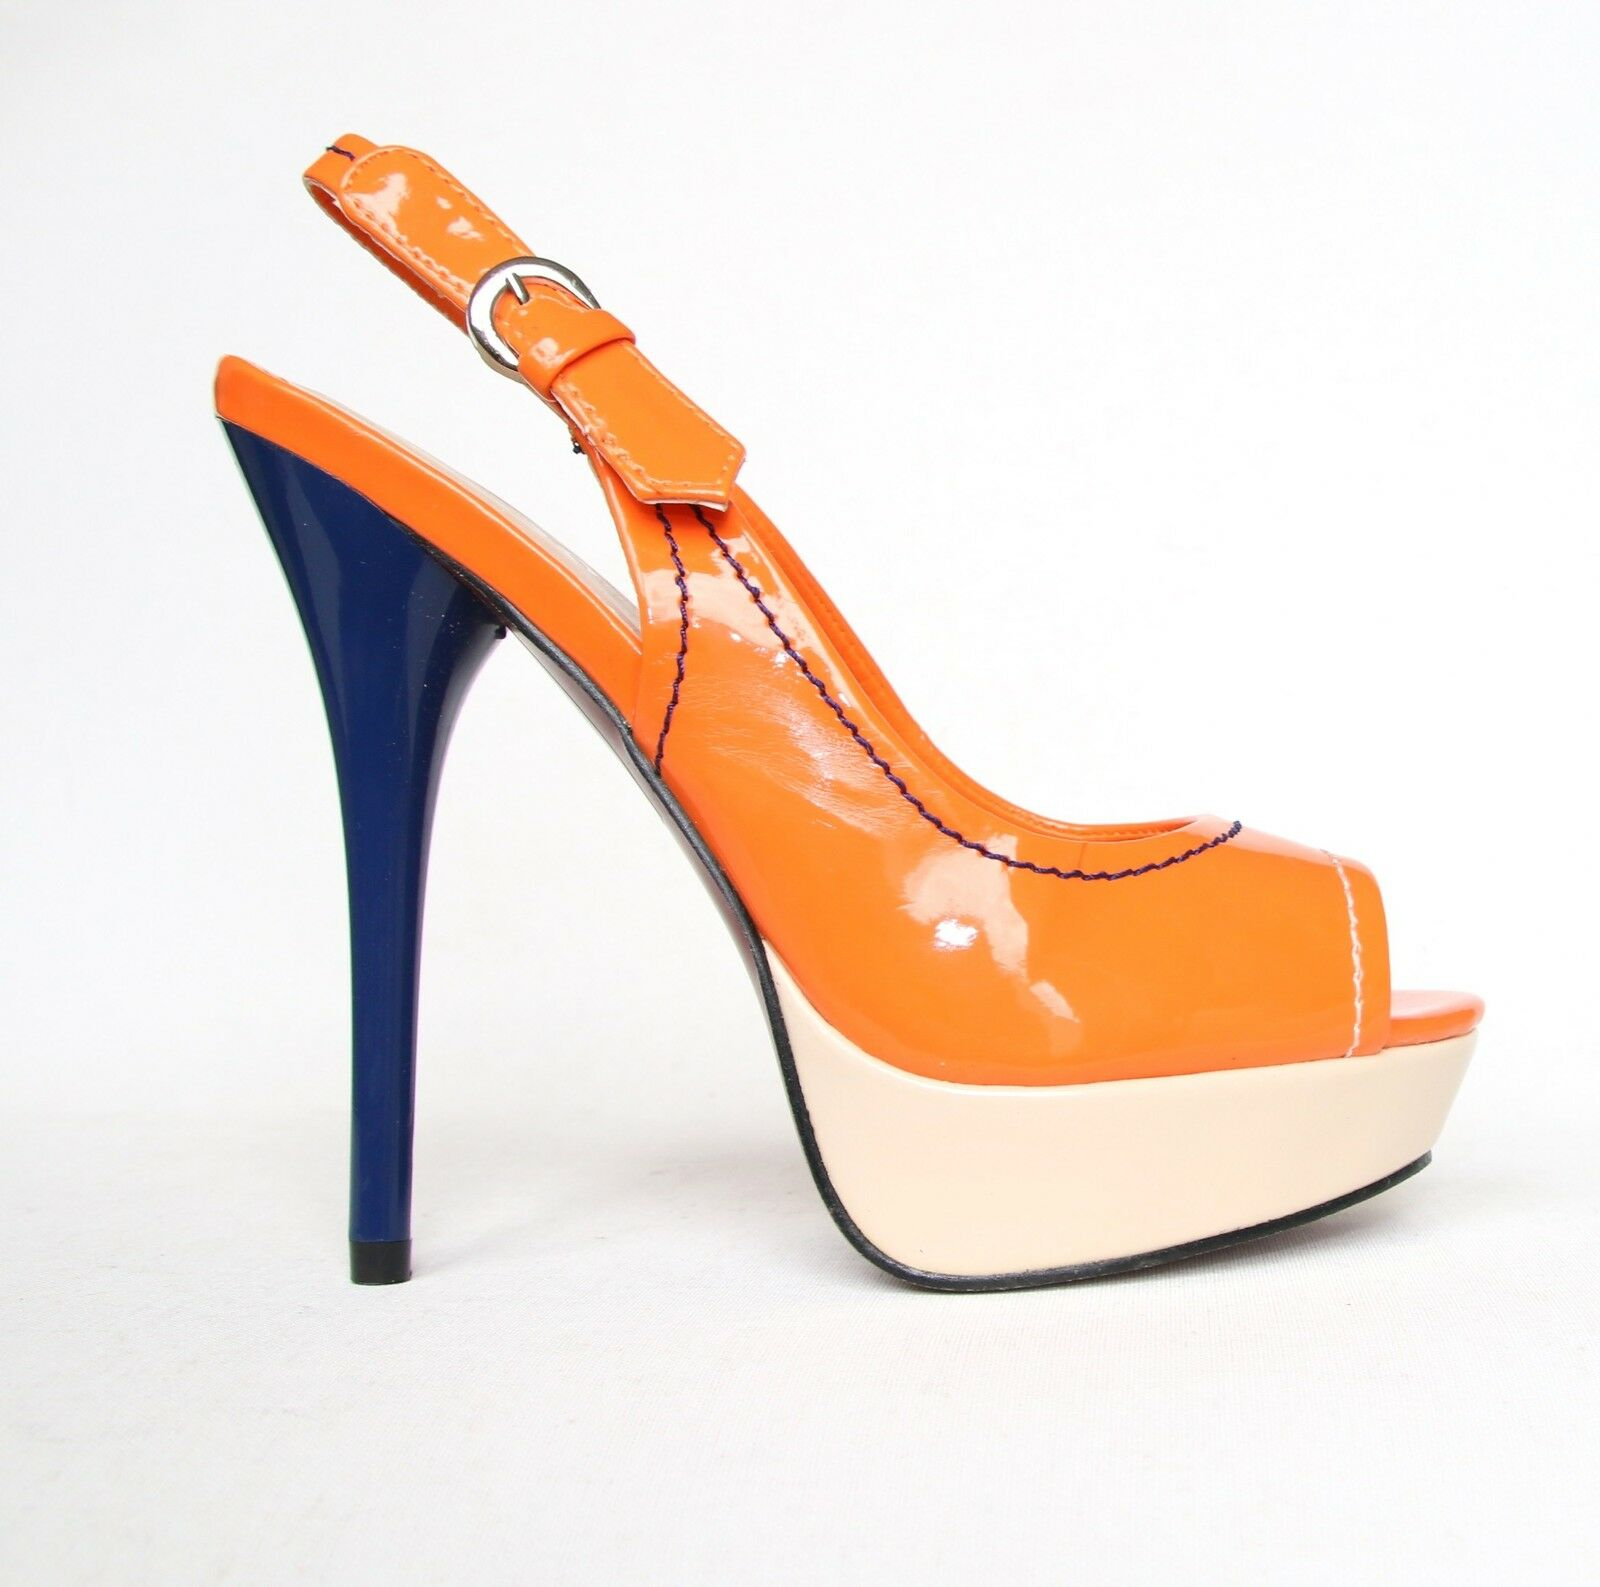 Lack High Heels Stilettos Pumps 36 Orange Riemchen Sandaletten Peeptoes 1817-GL